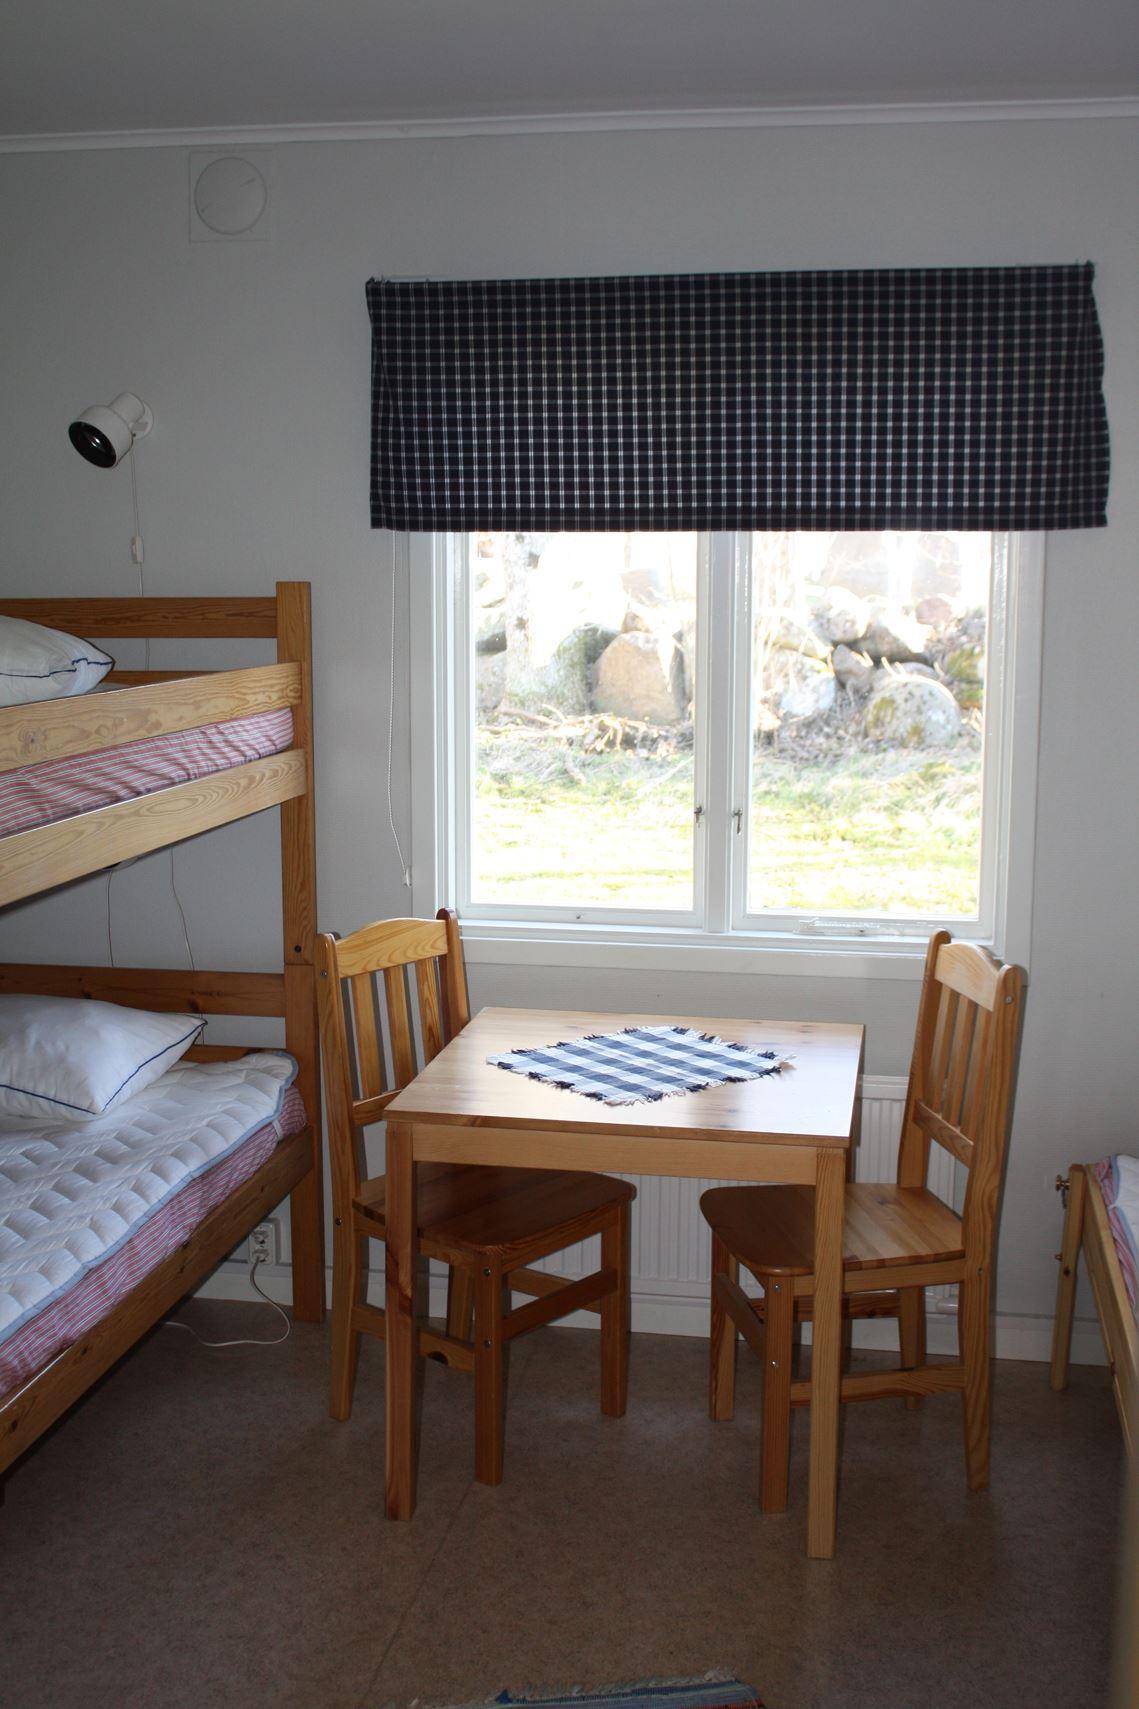 Hunnebostrand Youth Hostel SVIF, Hunnebostrand